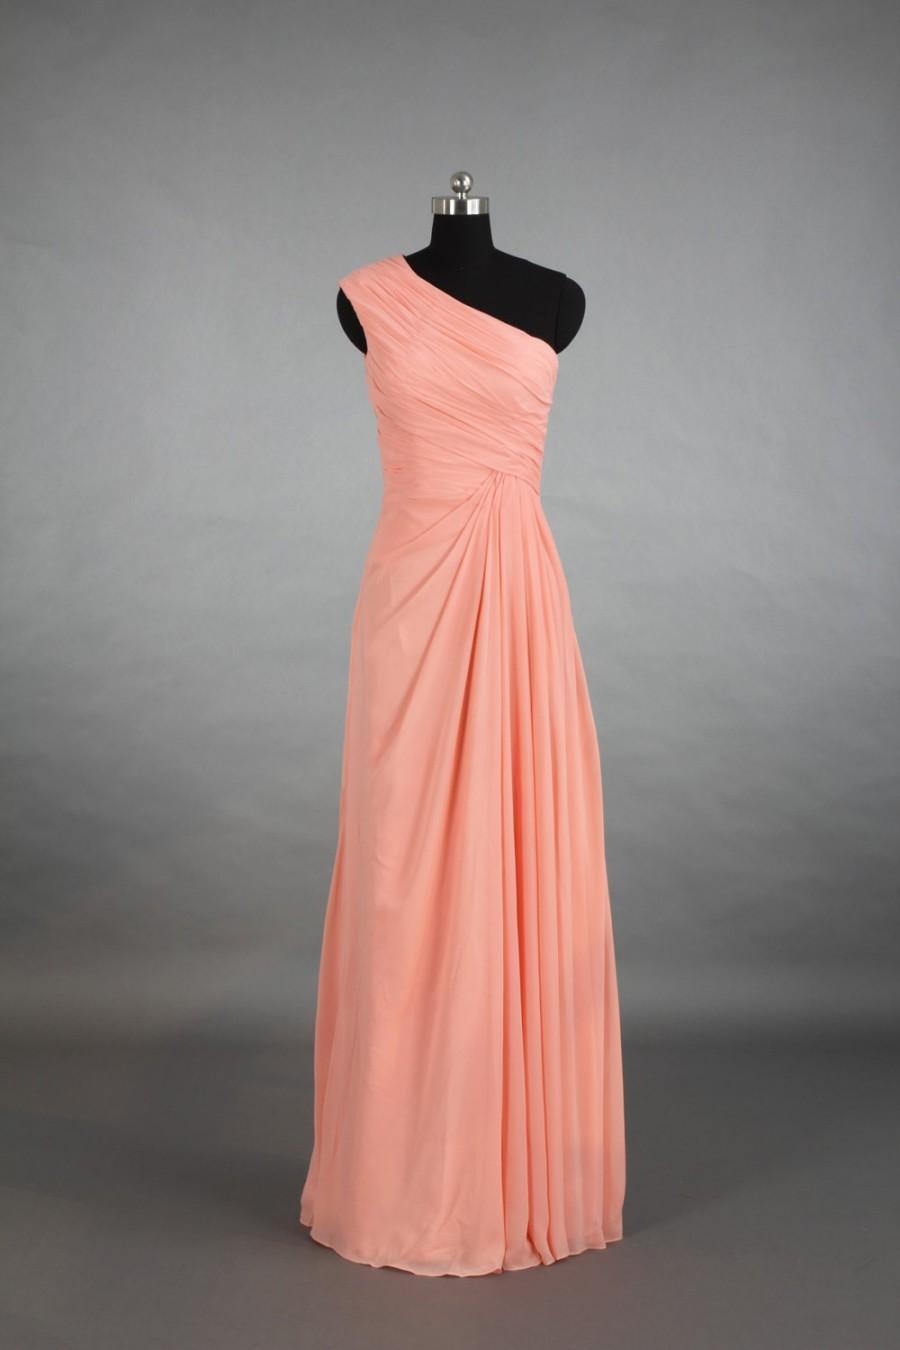 Wedding - One Shoulder Bridesmaid Dress, Floor-Length Peach Pink Chiffon Bridesmaid Dress